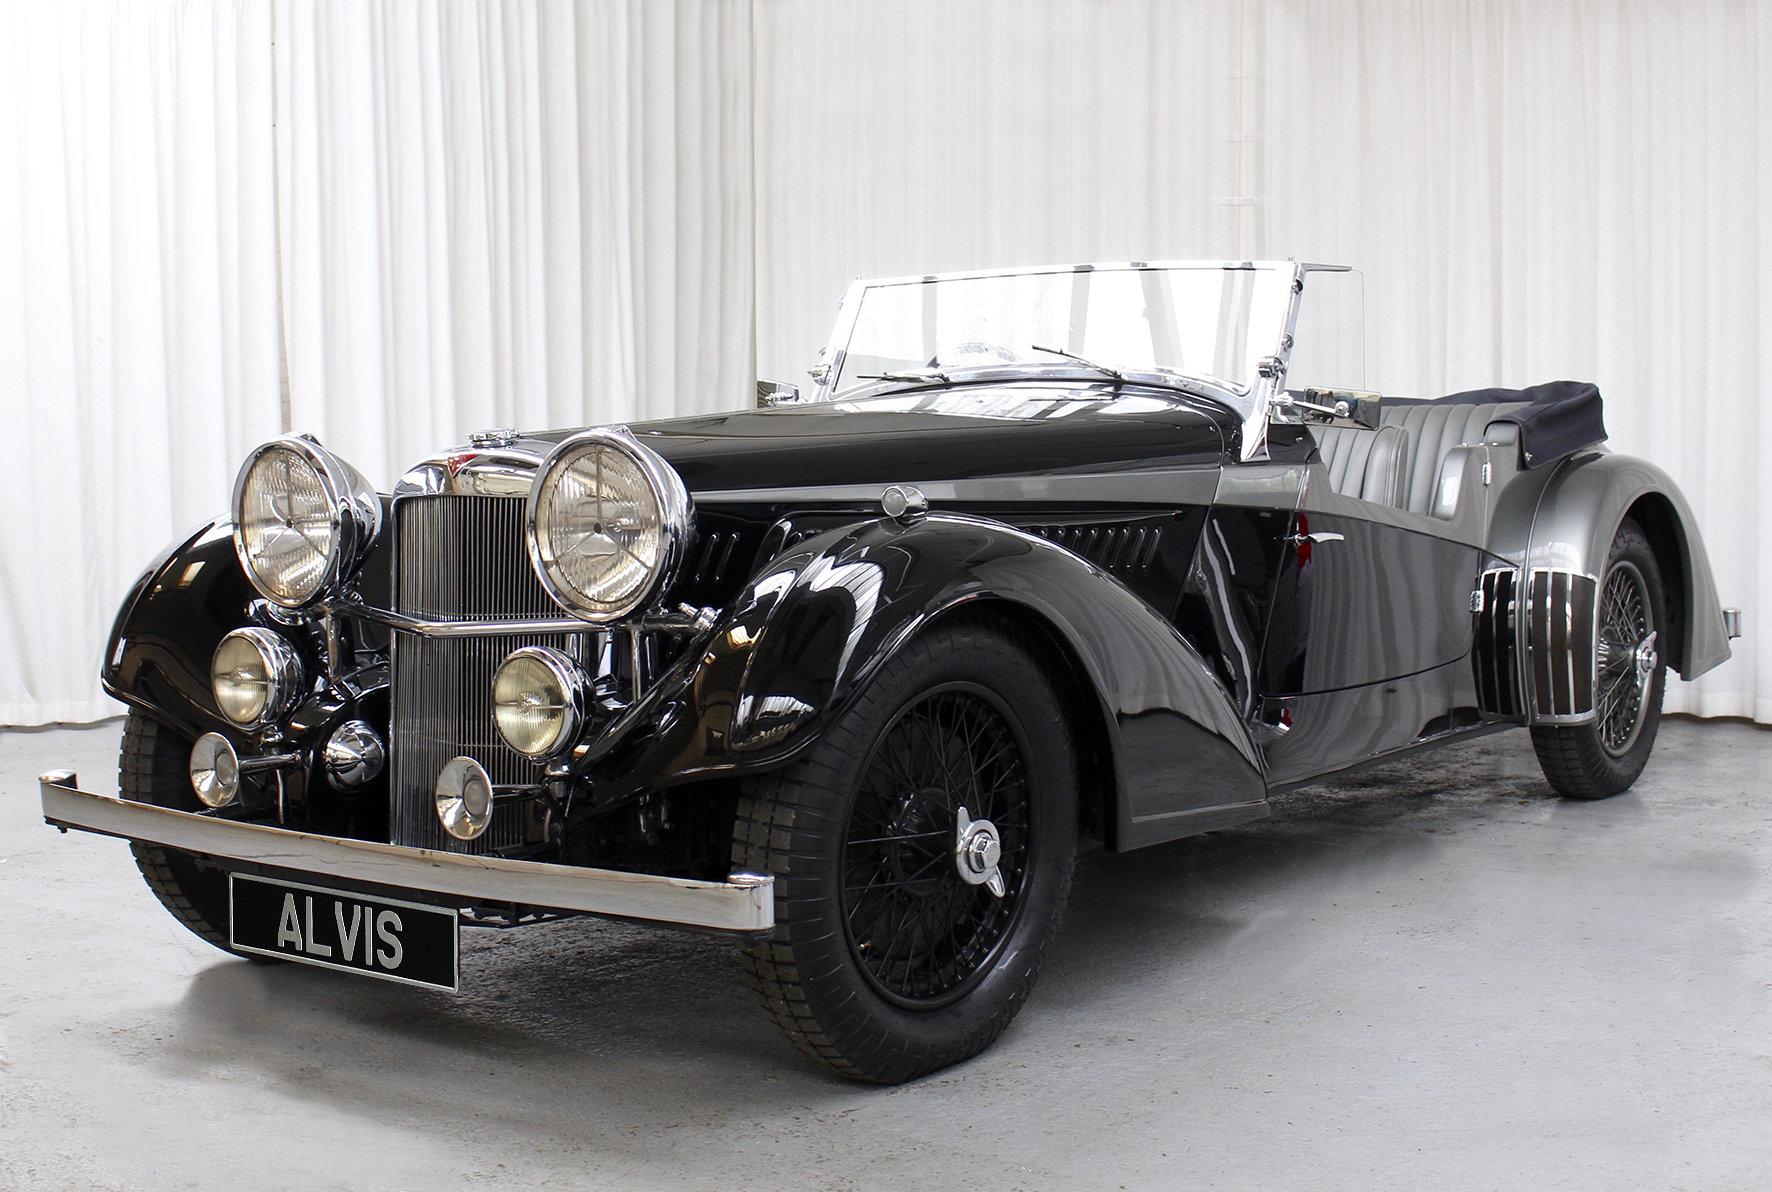 1937 4.3 Vanden Plas Style Tourer For Sale (picture 2 of 6)